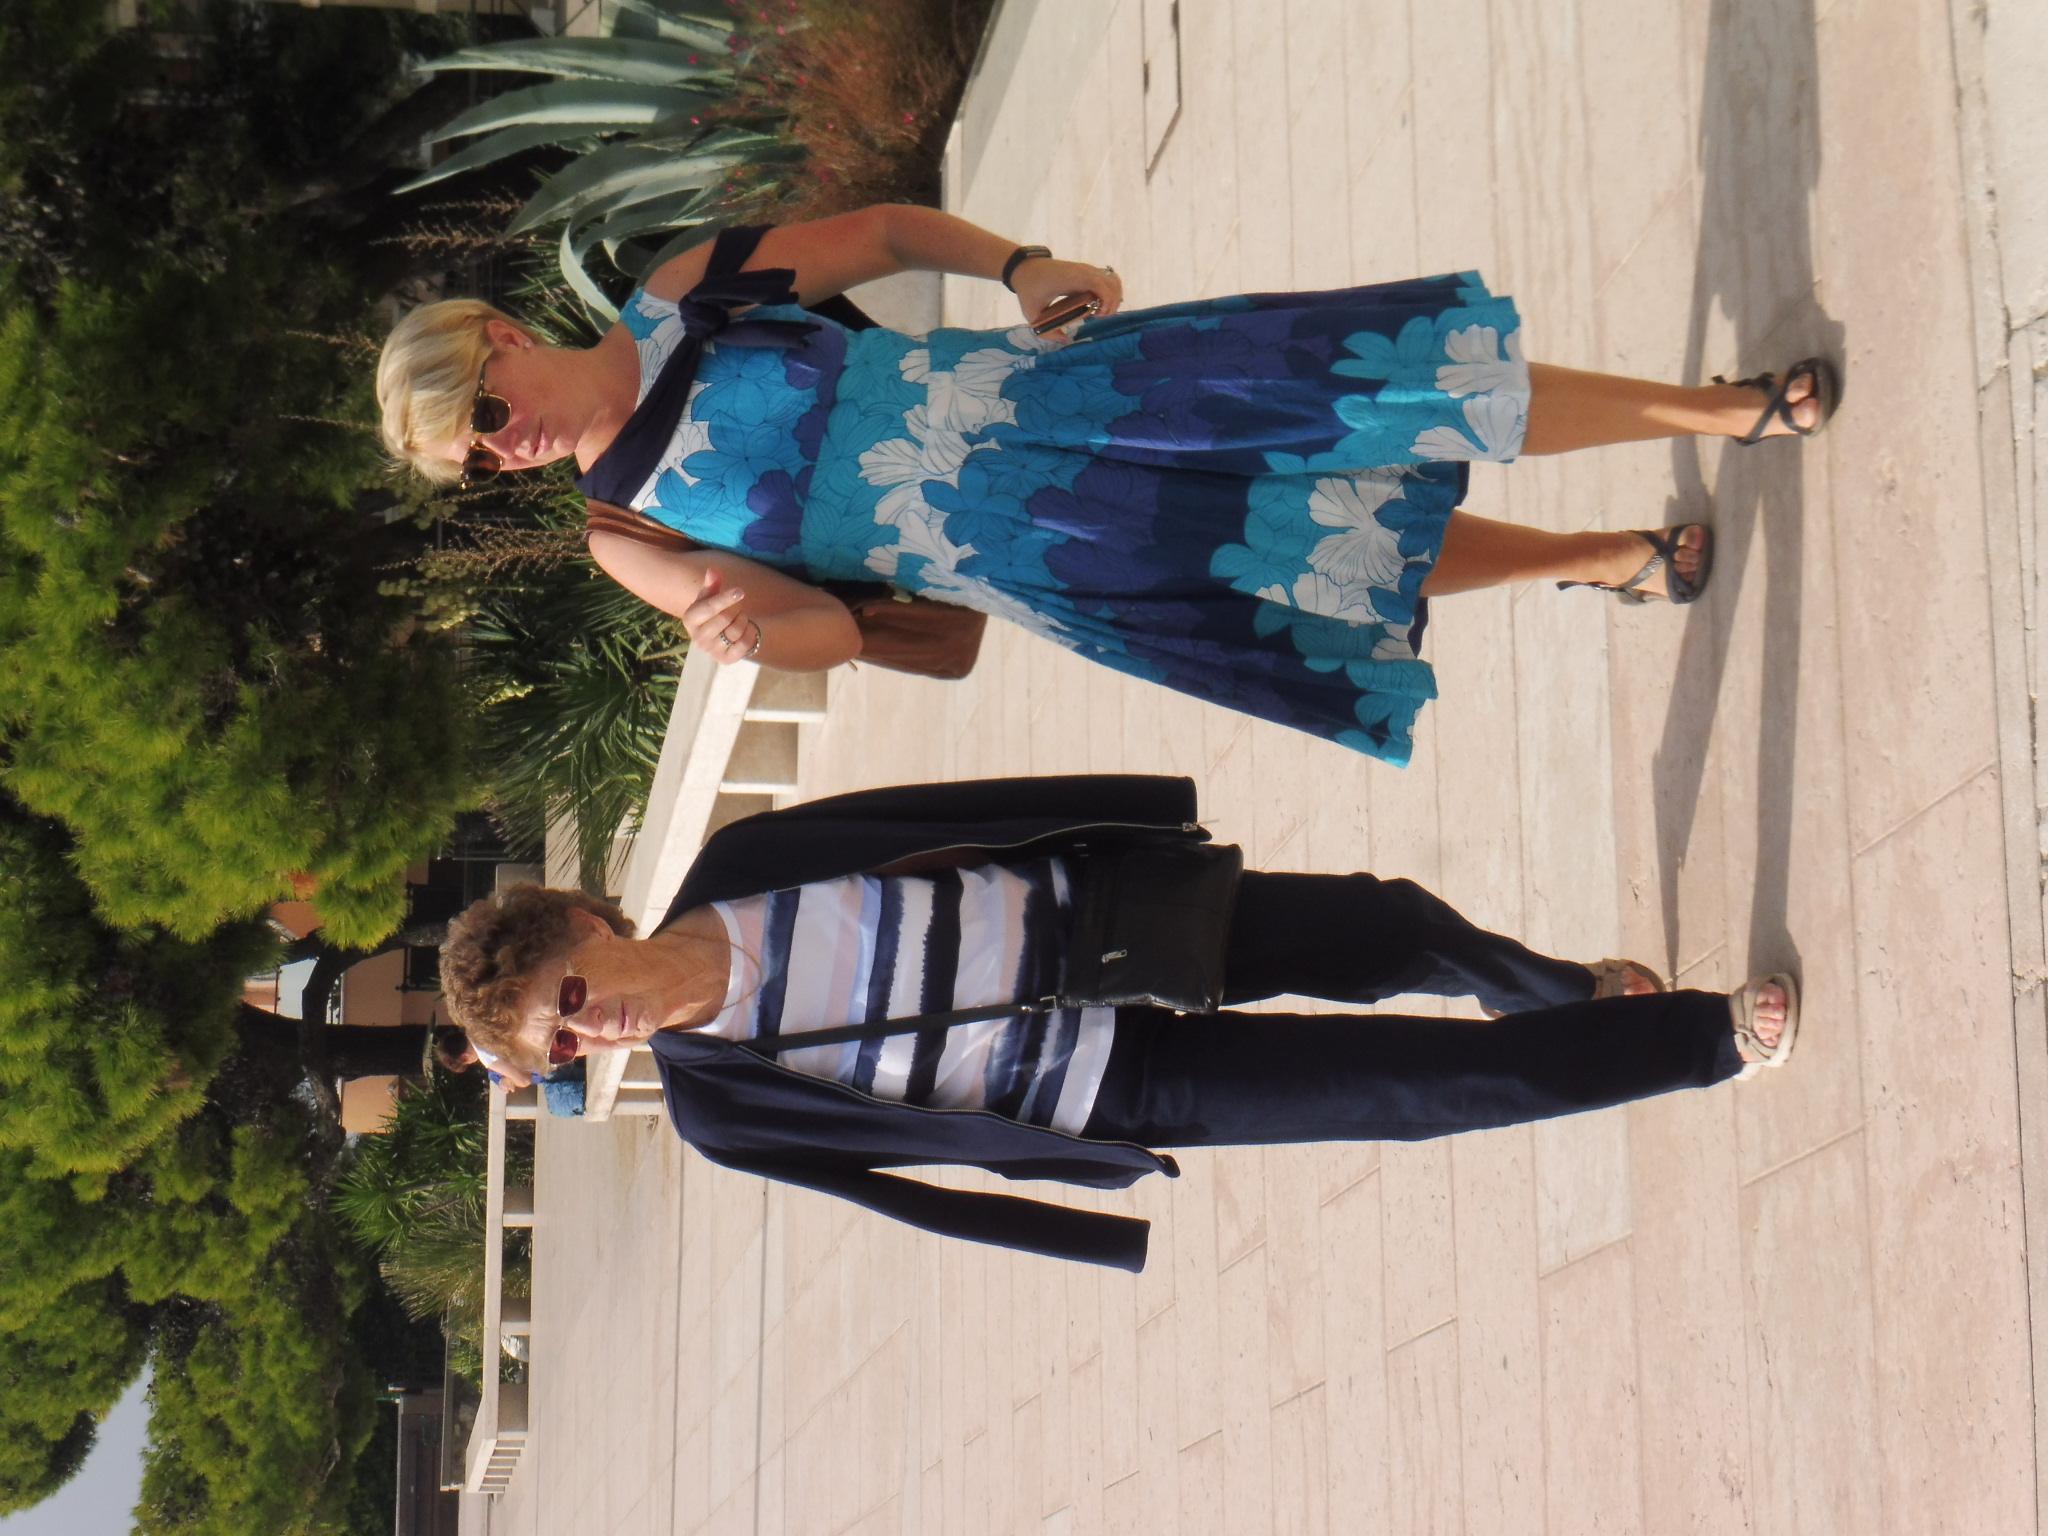 E. Walking along the prom